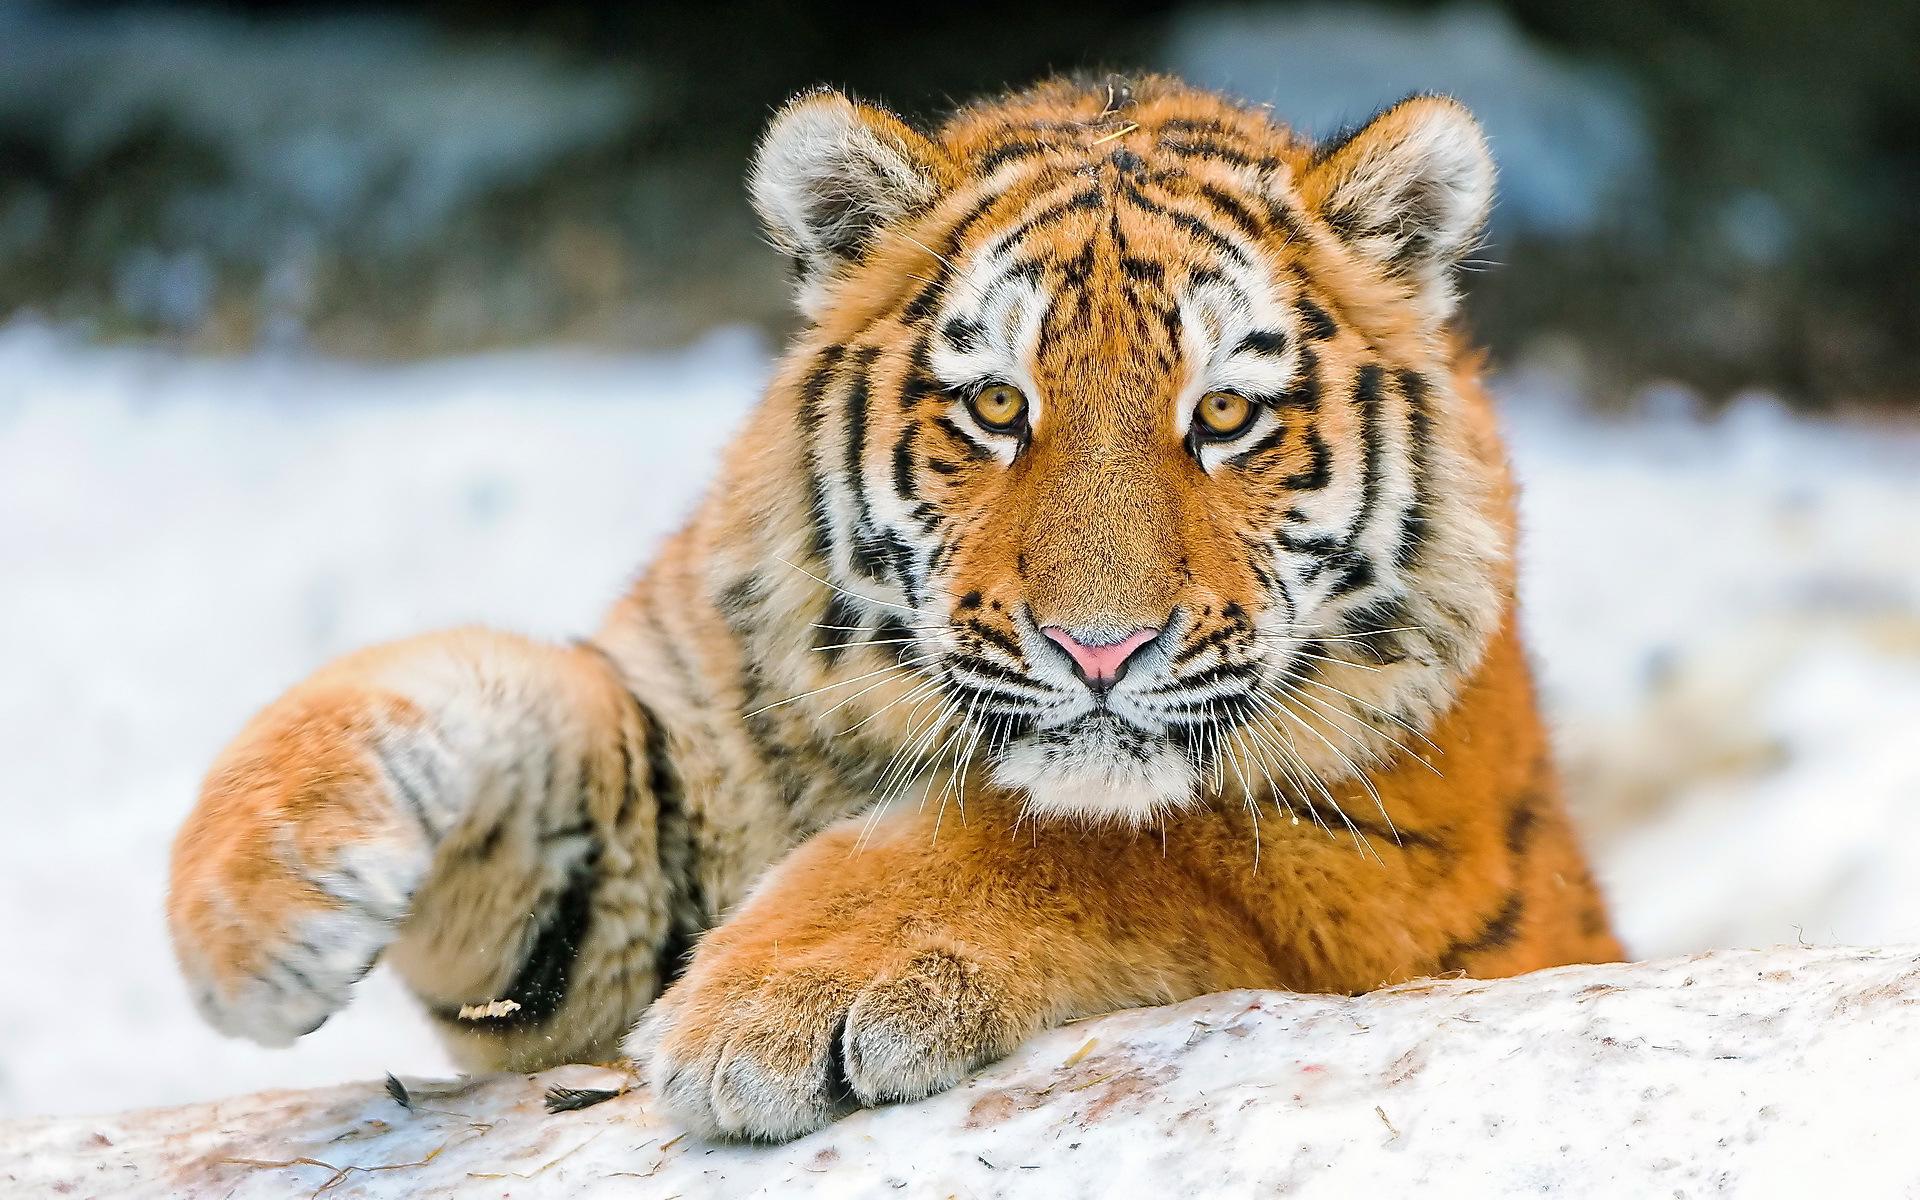 tiger cute animal